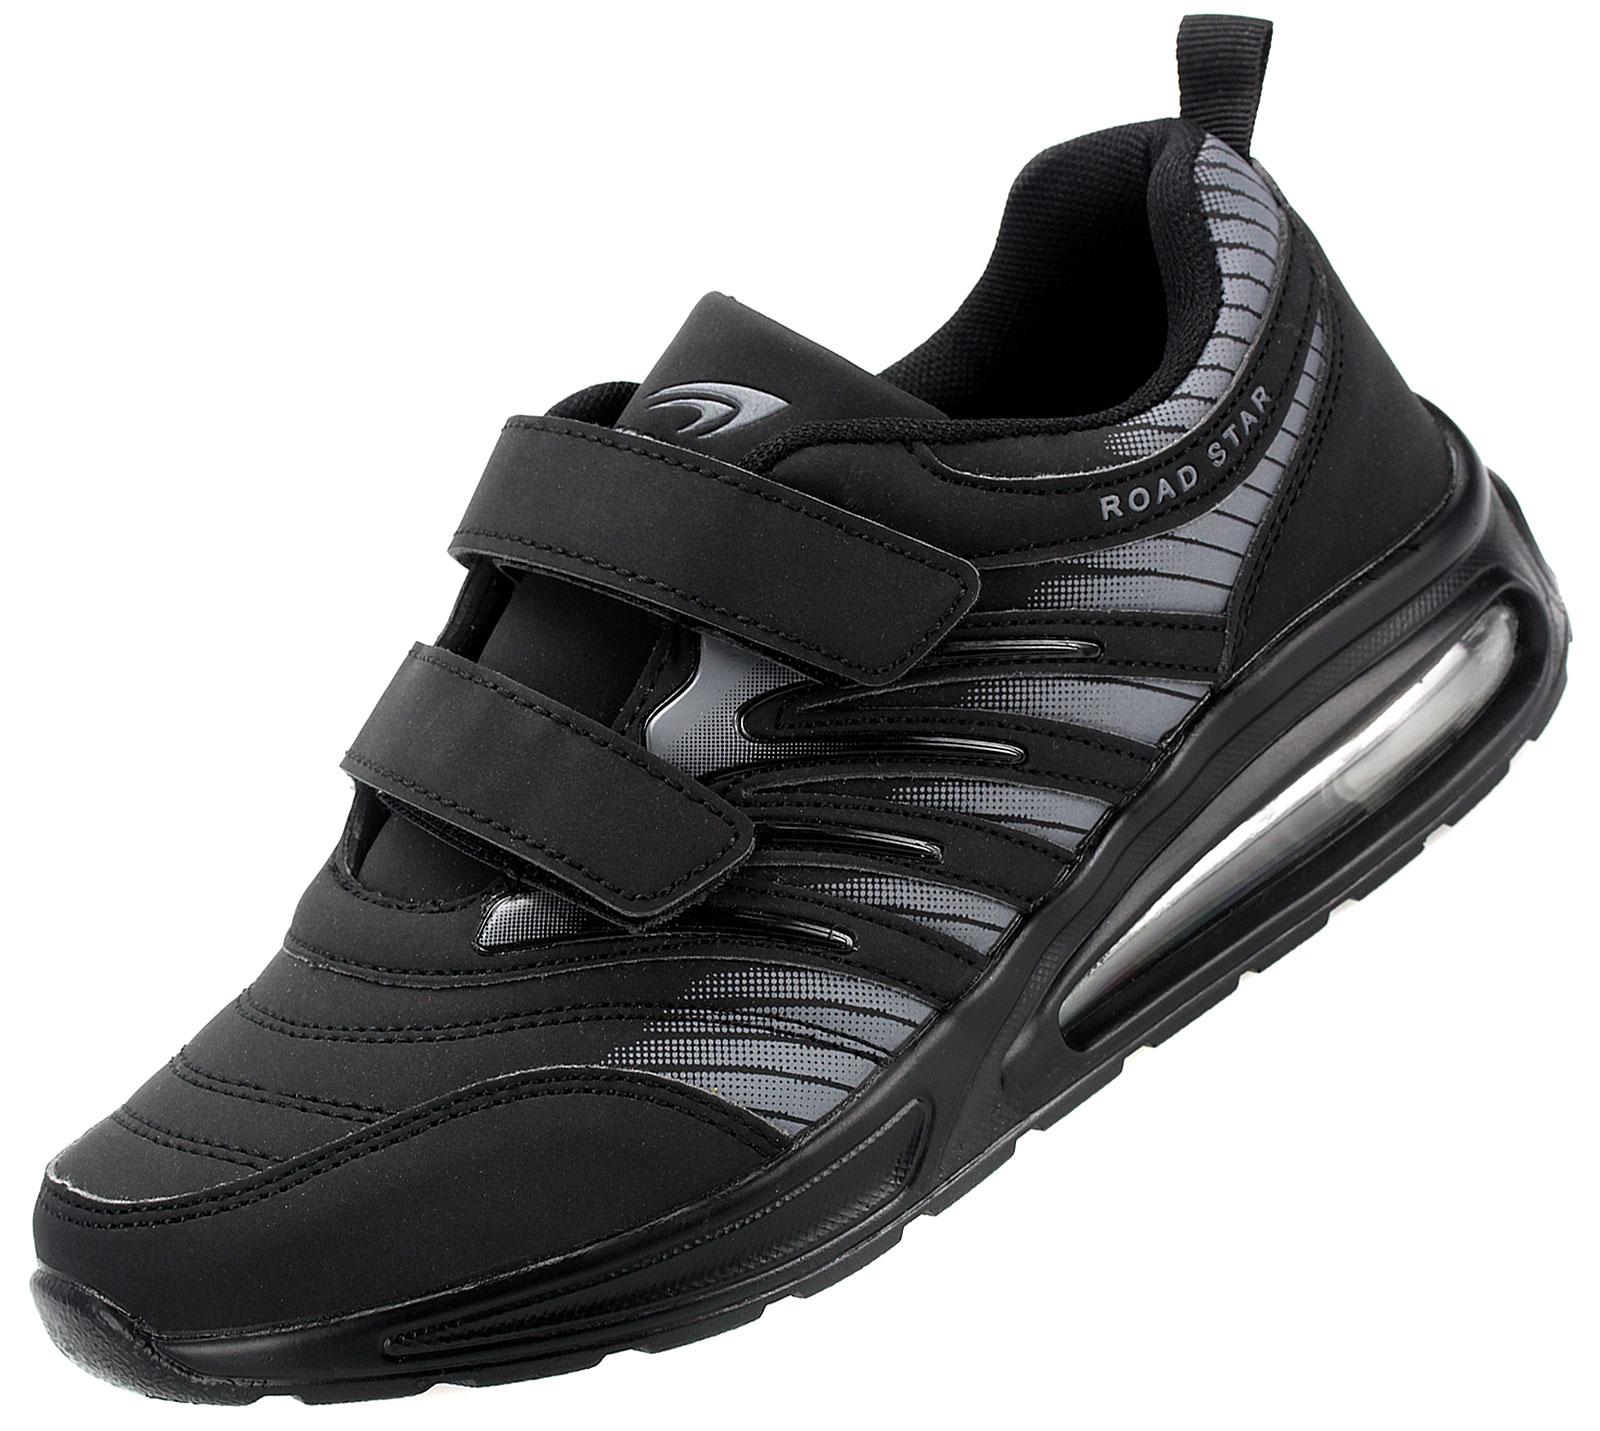 Damen Herren Sneaker Sportschuhe Freizeitschuhe Laufschuhe Turnschuhe Klettverschluss